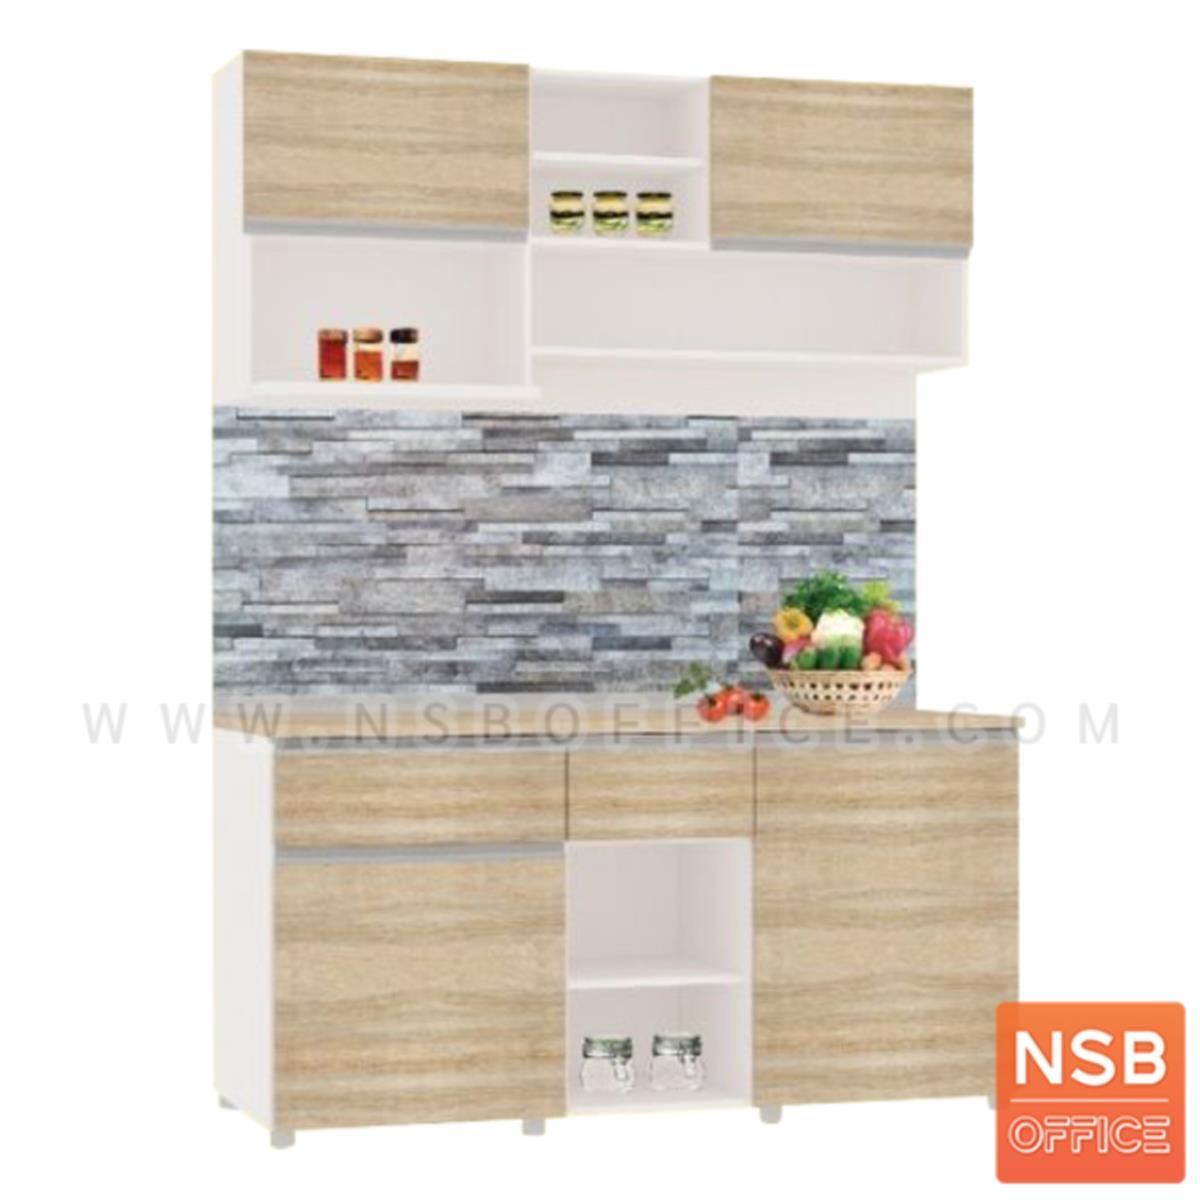 K05A014:ชุดตู้ครัวพร้อมตู้แขวน 2 บานเปิก 2 ลิ้นชัก รุ่น Brenna (เบรนน่า) ขนาด 160W cm. สีเนเจอร์ทีค-ขาว